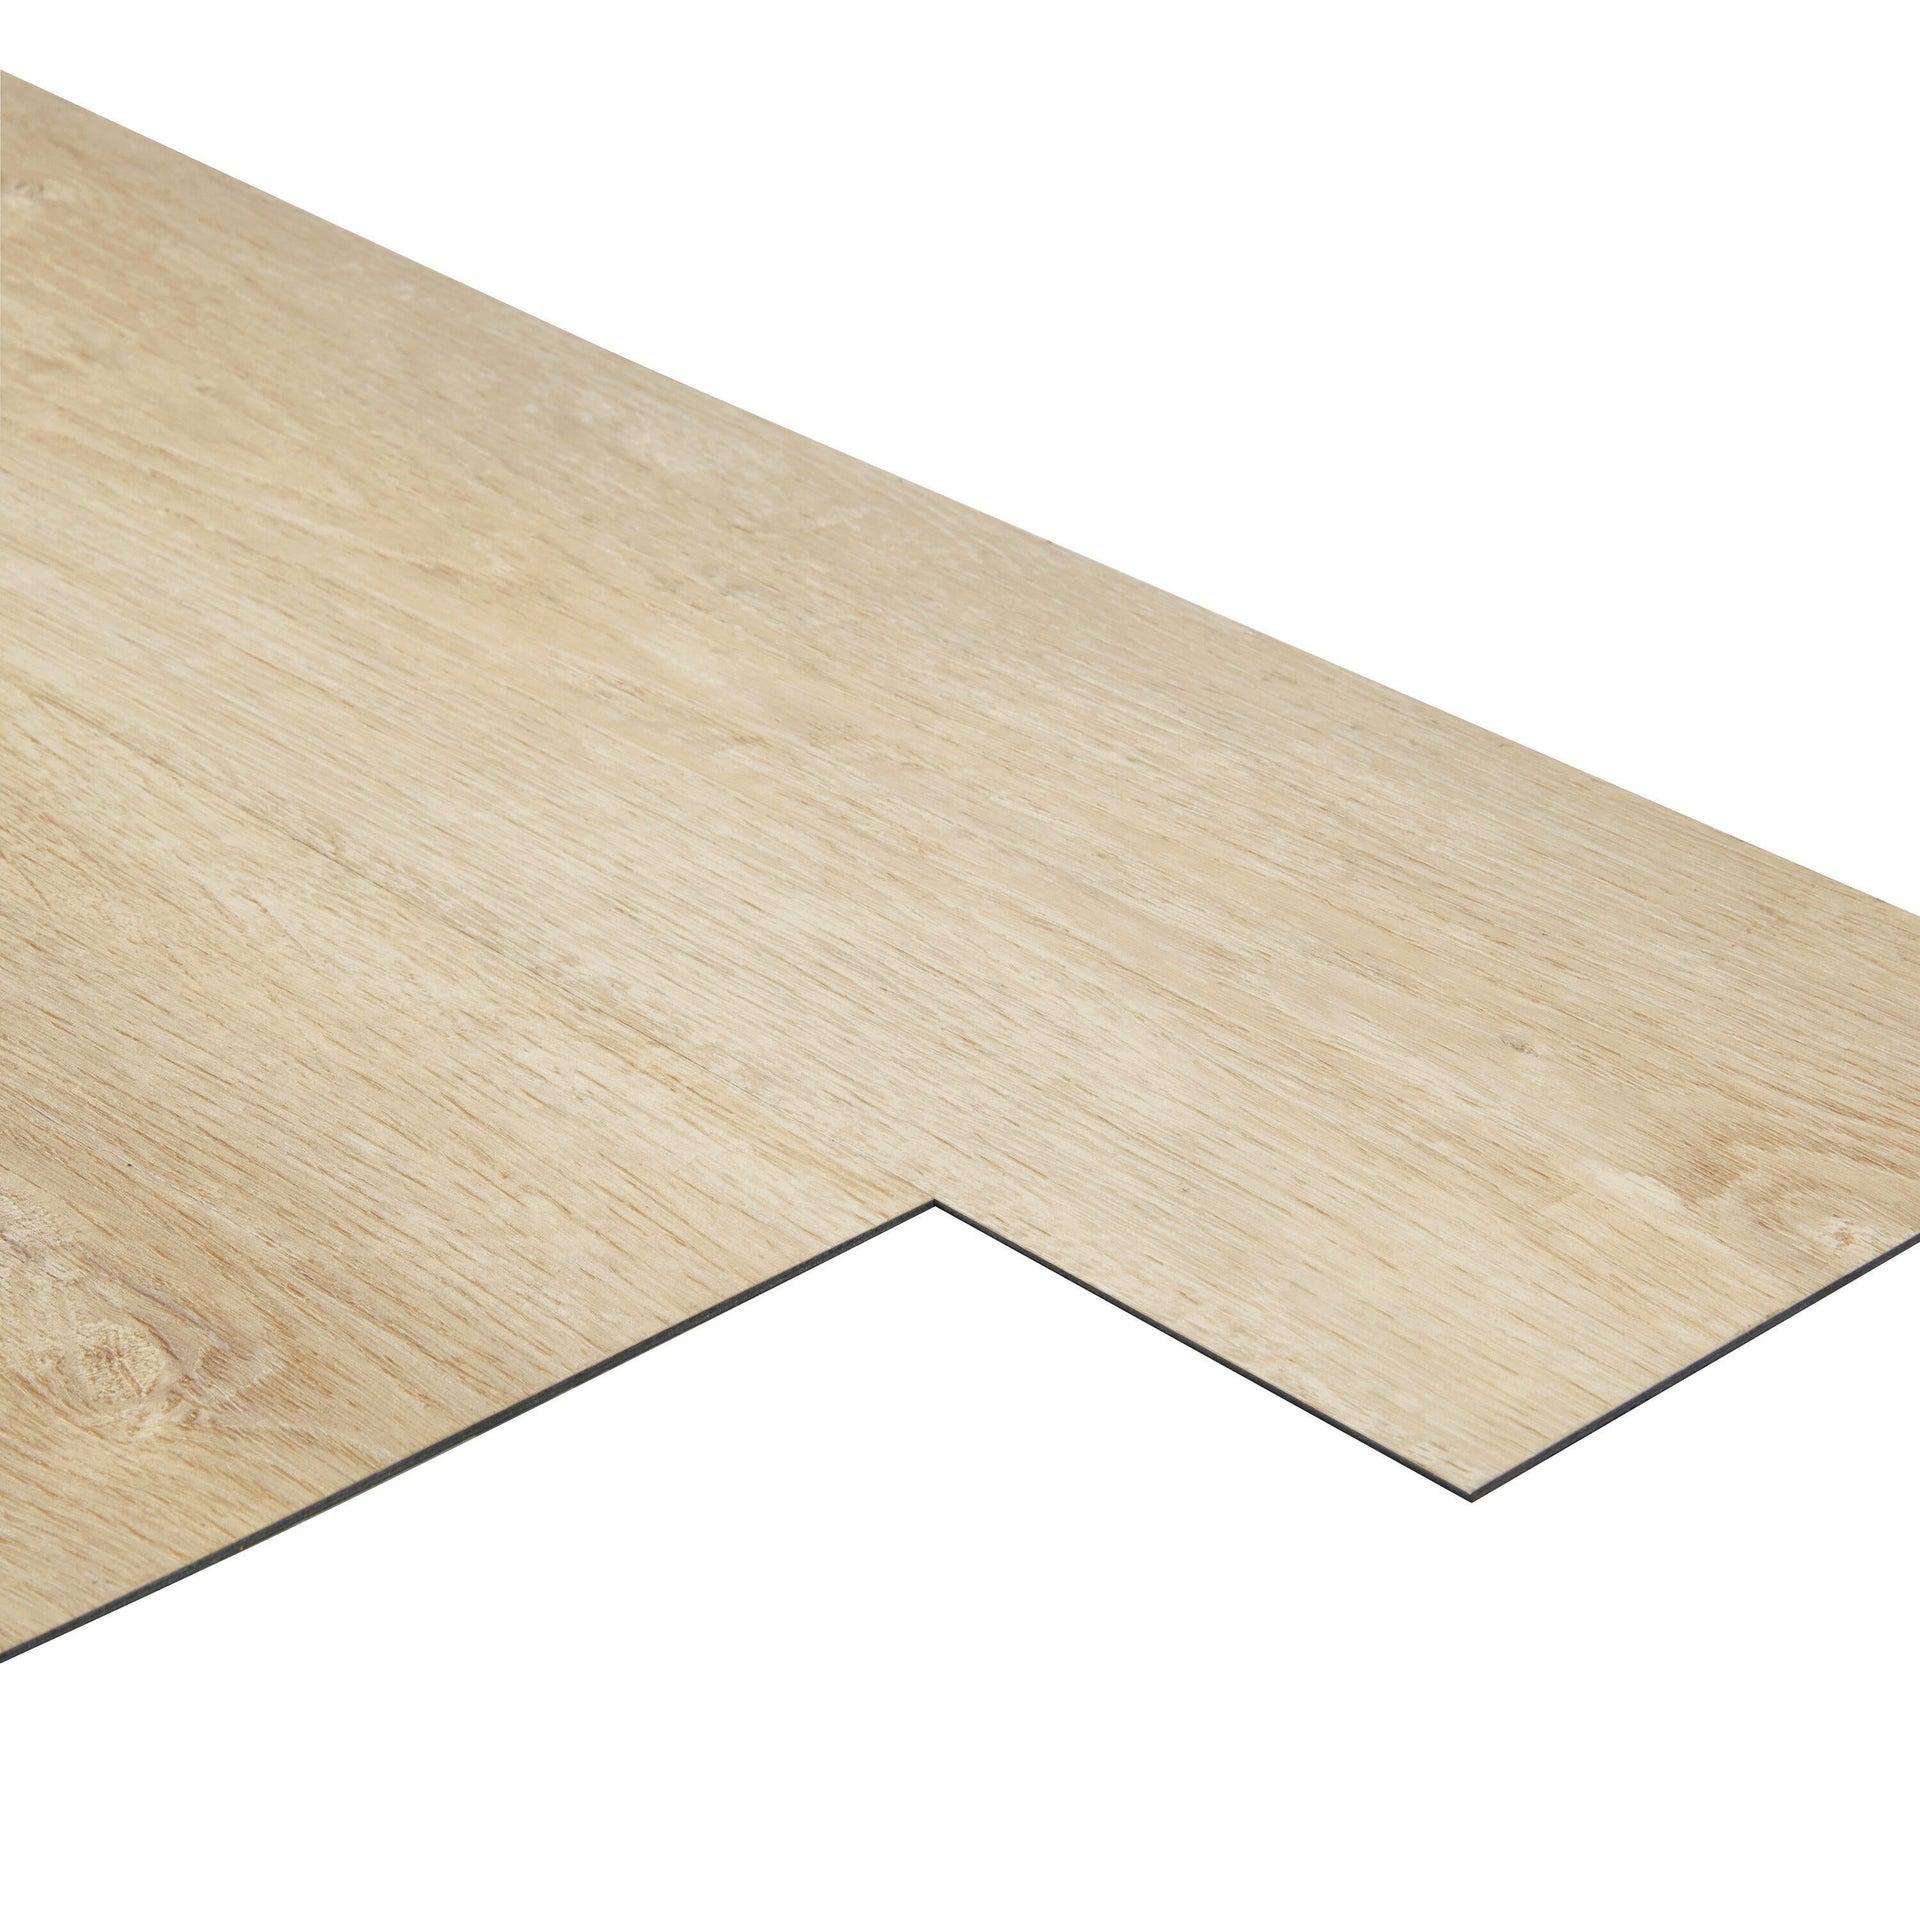 Pavimento PVC adesivo Senso Baladlight Sp 2.5 mm beige - 2